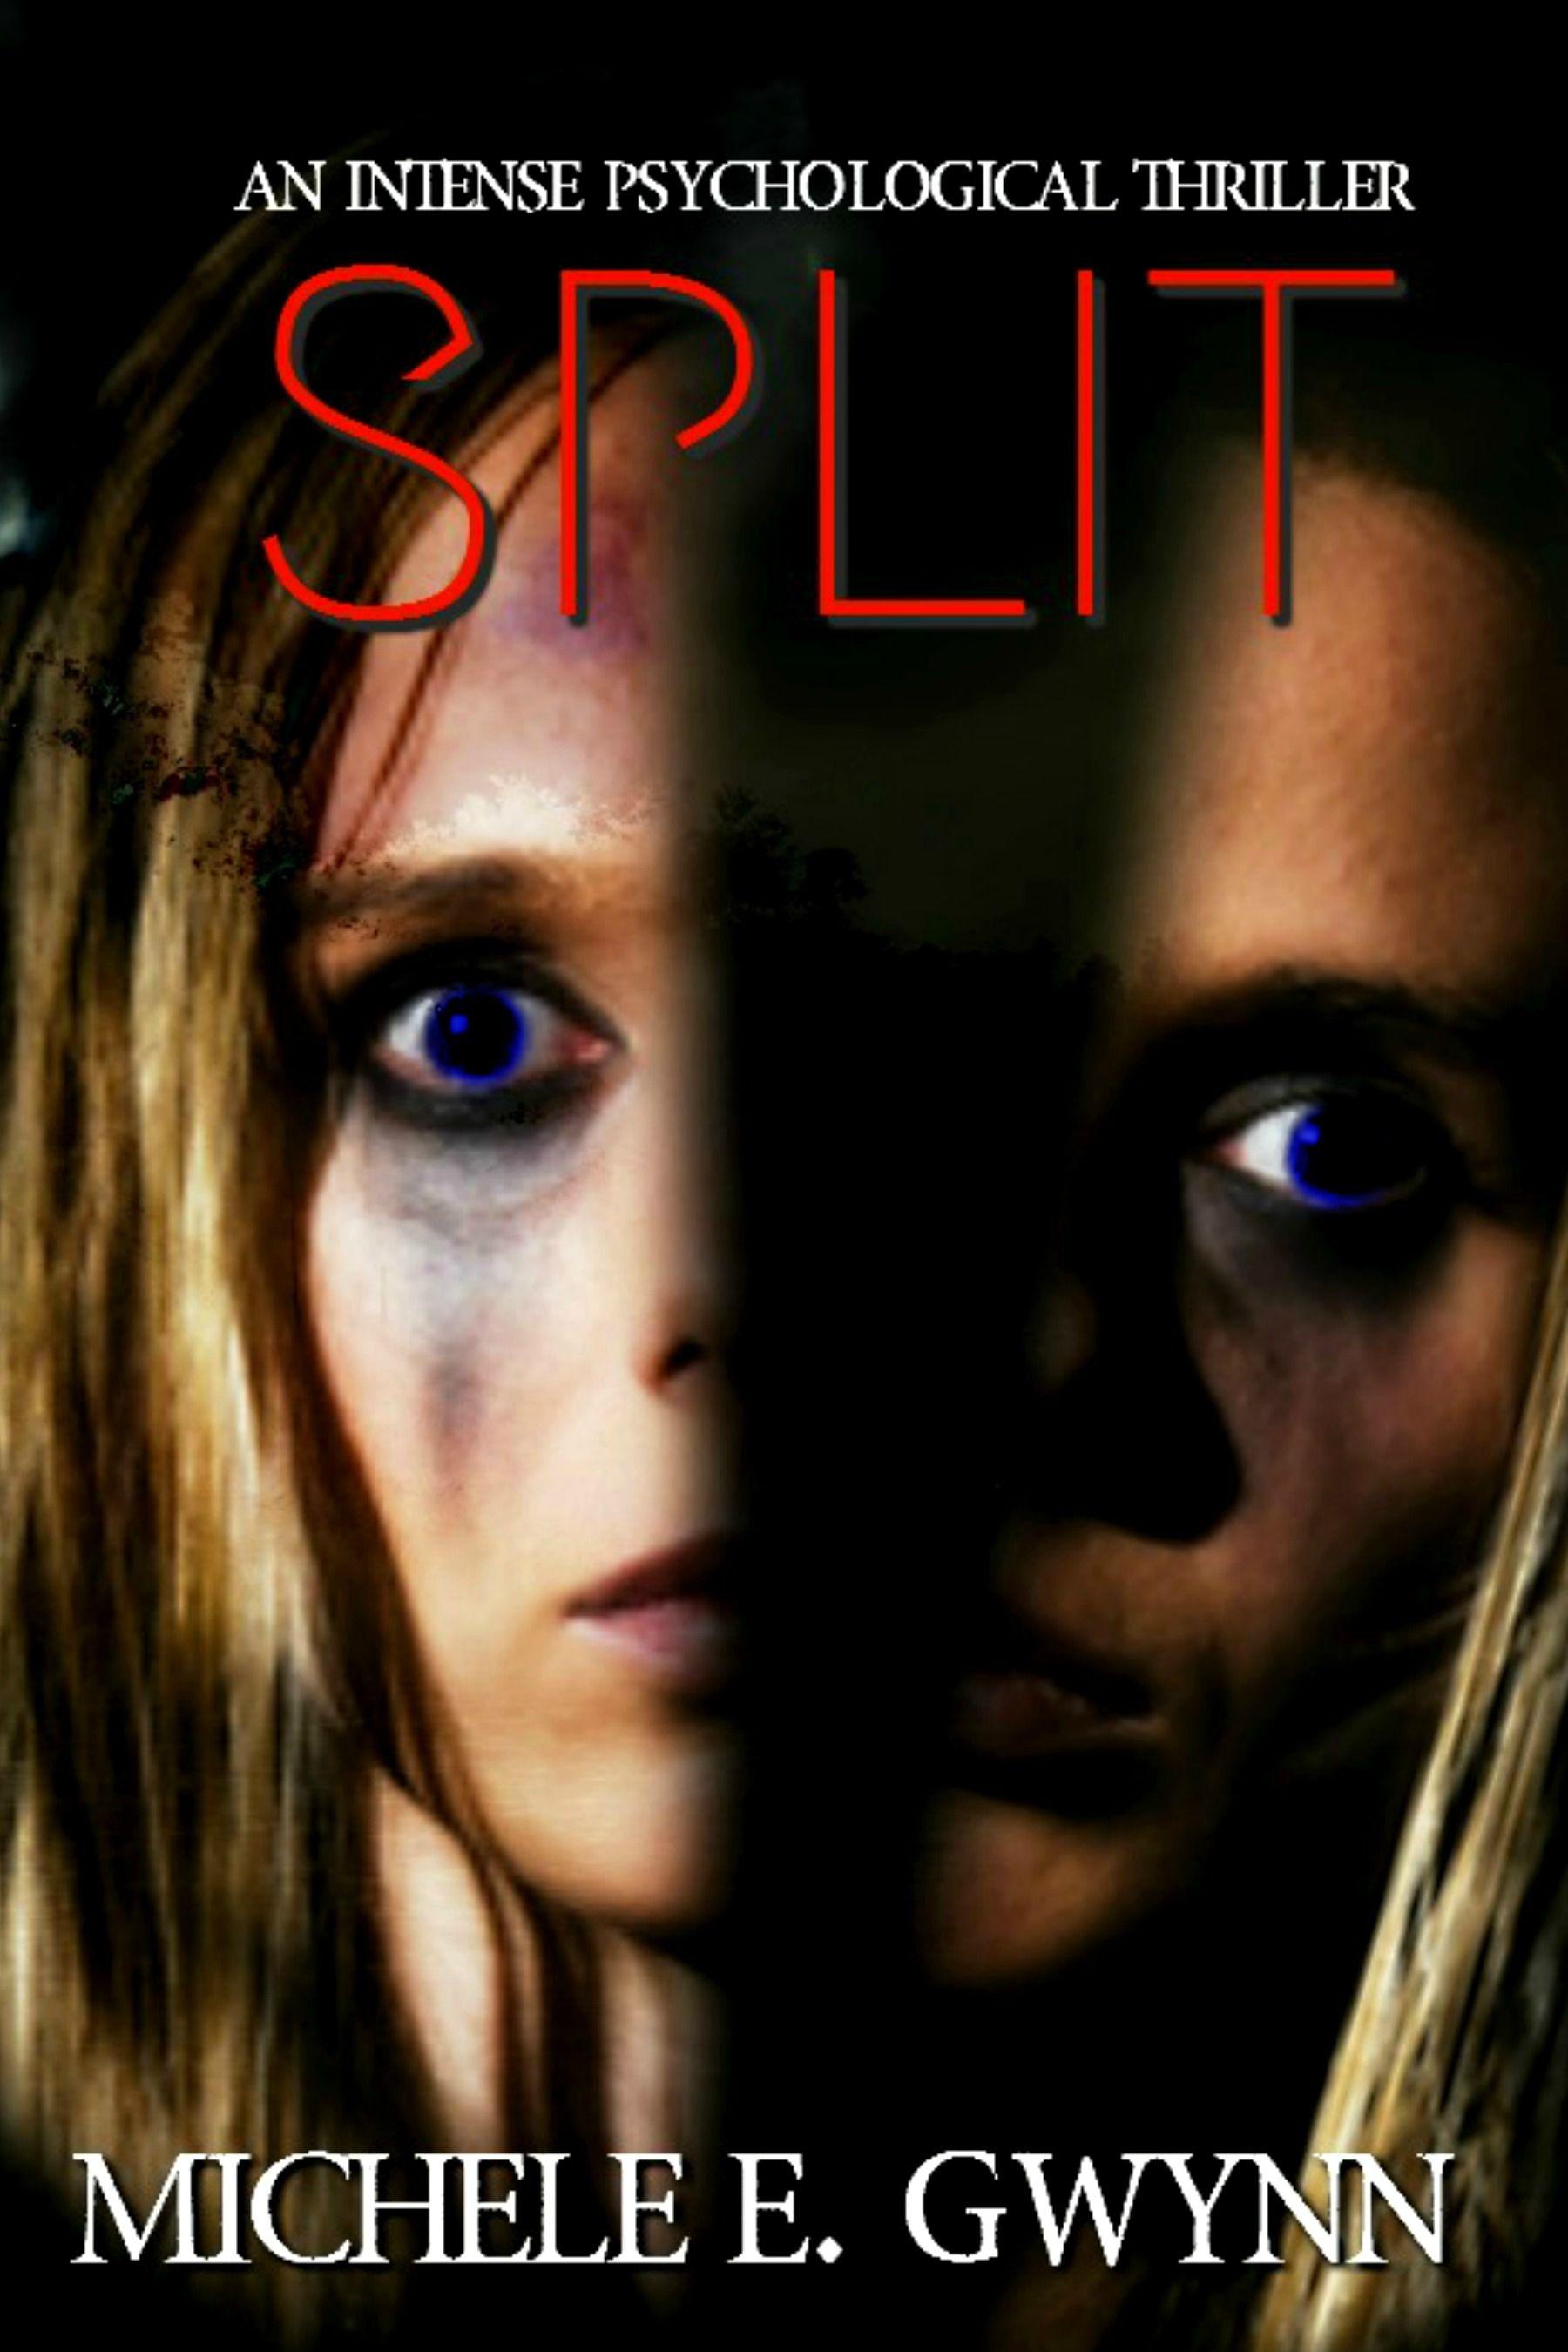 Split by Michele E. Gwynn. Intense Psychological Thriller. Free! http://www.ebooksoda.com/ebook-deals/split-by-michele-e-gwynn